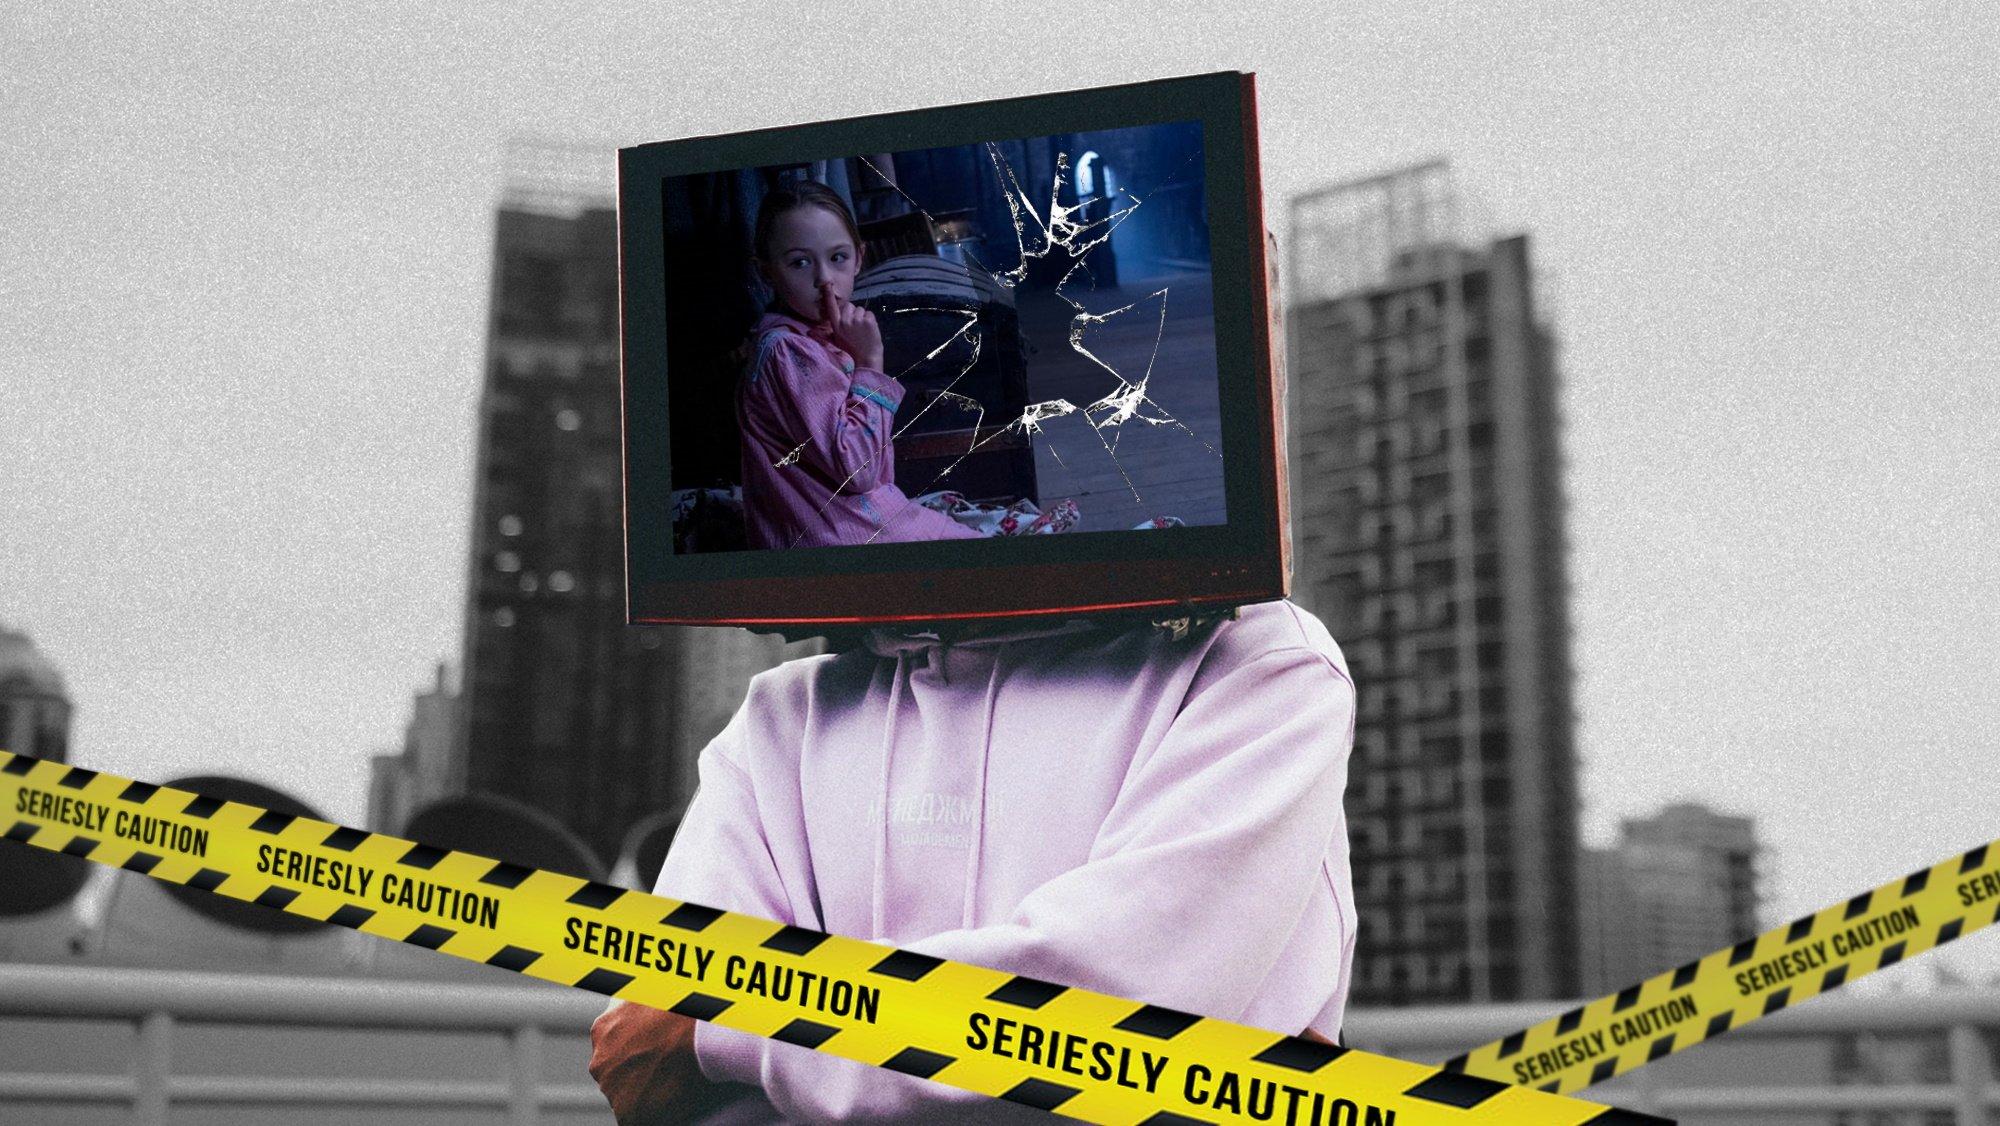 TV Aufreger Langeweile in Bly Manor